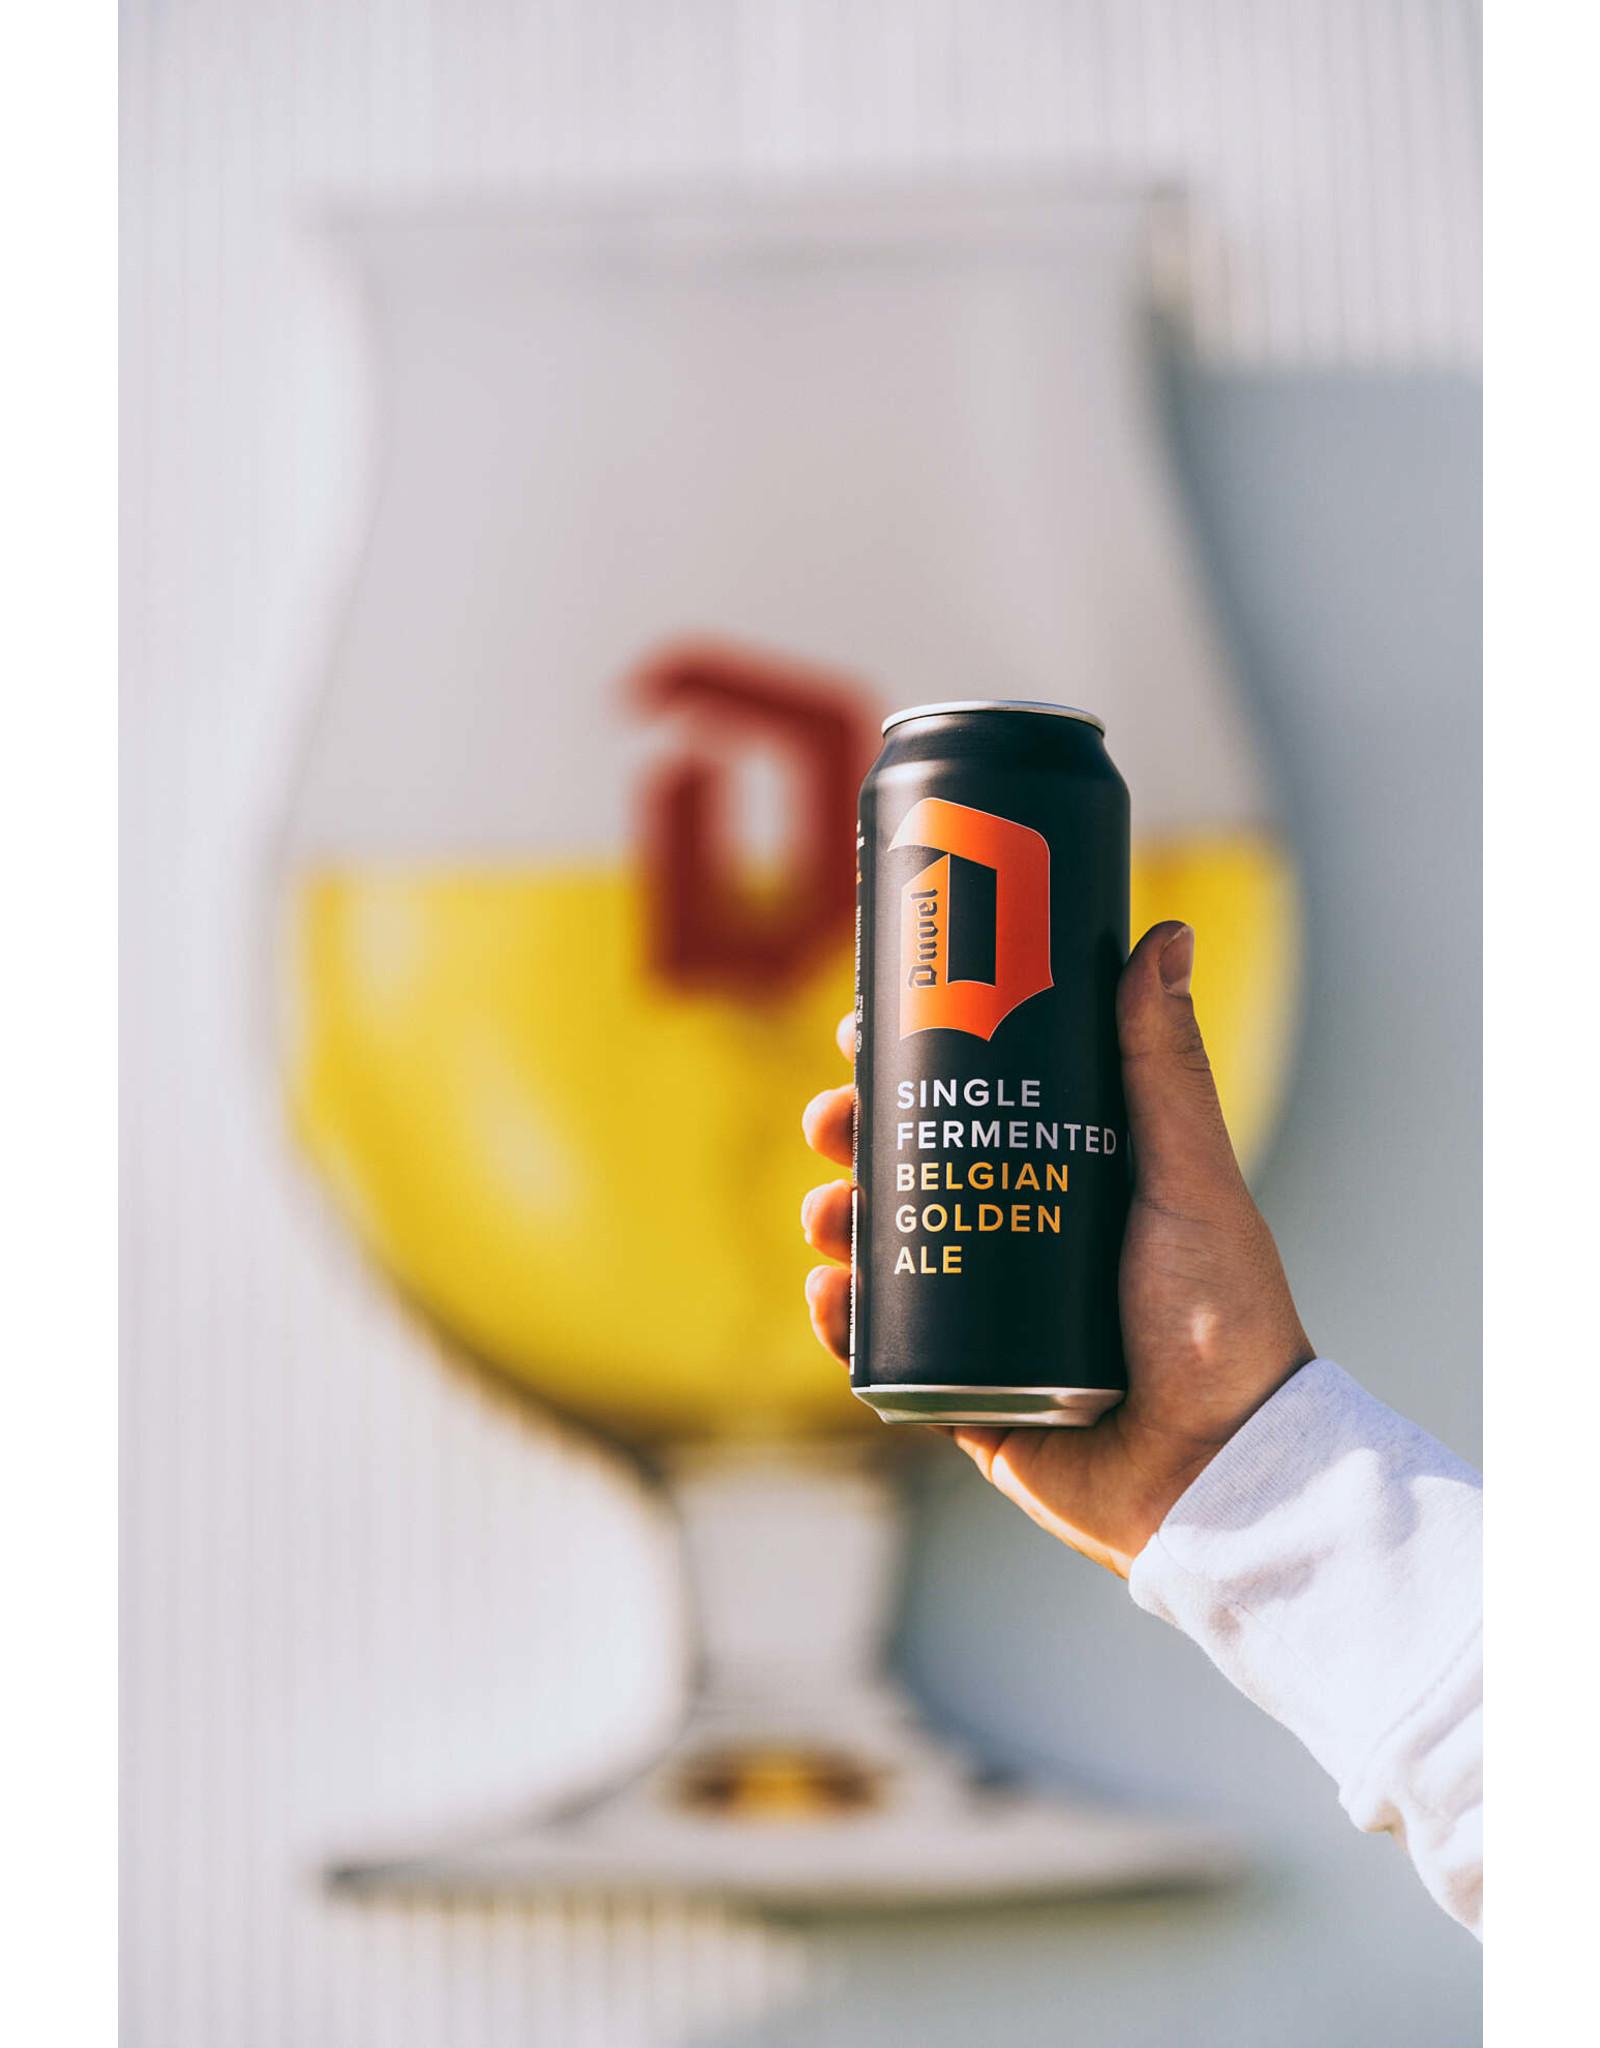 Duvel Duvel Single Fermented, Belgium Golden Ale